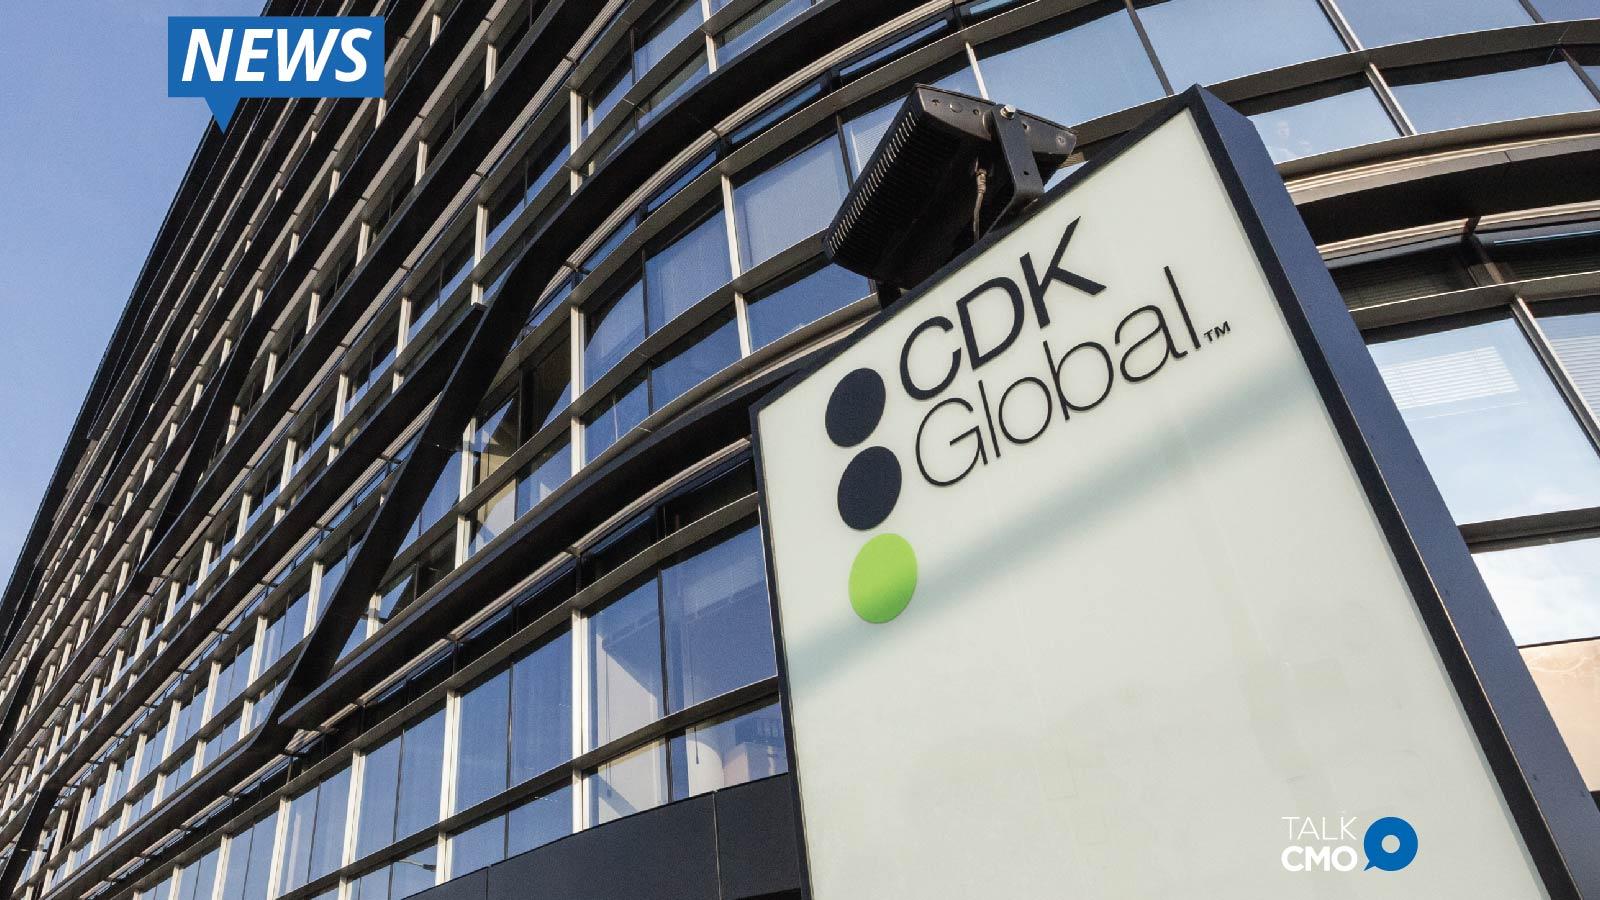 Wallpaper Cdk Global